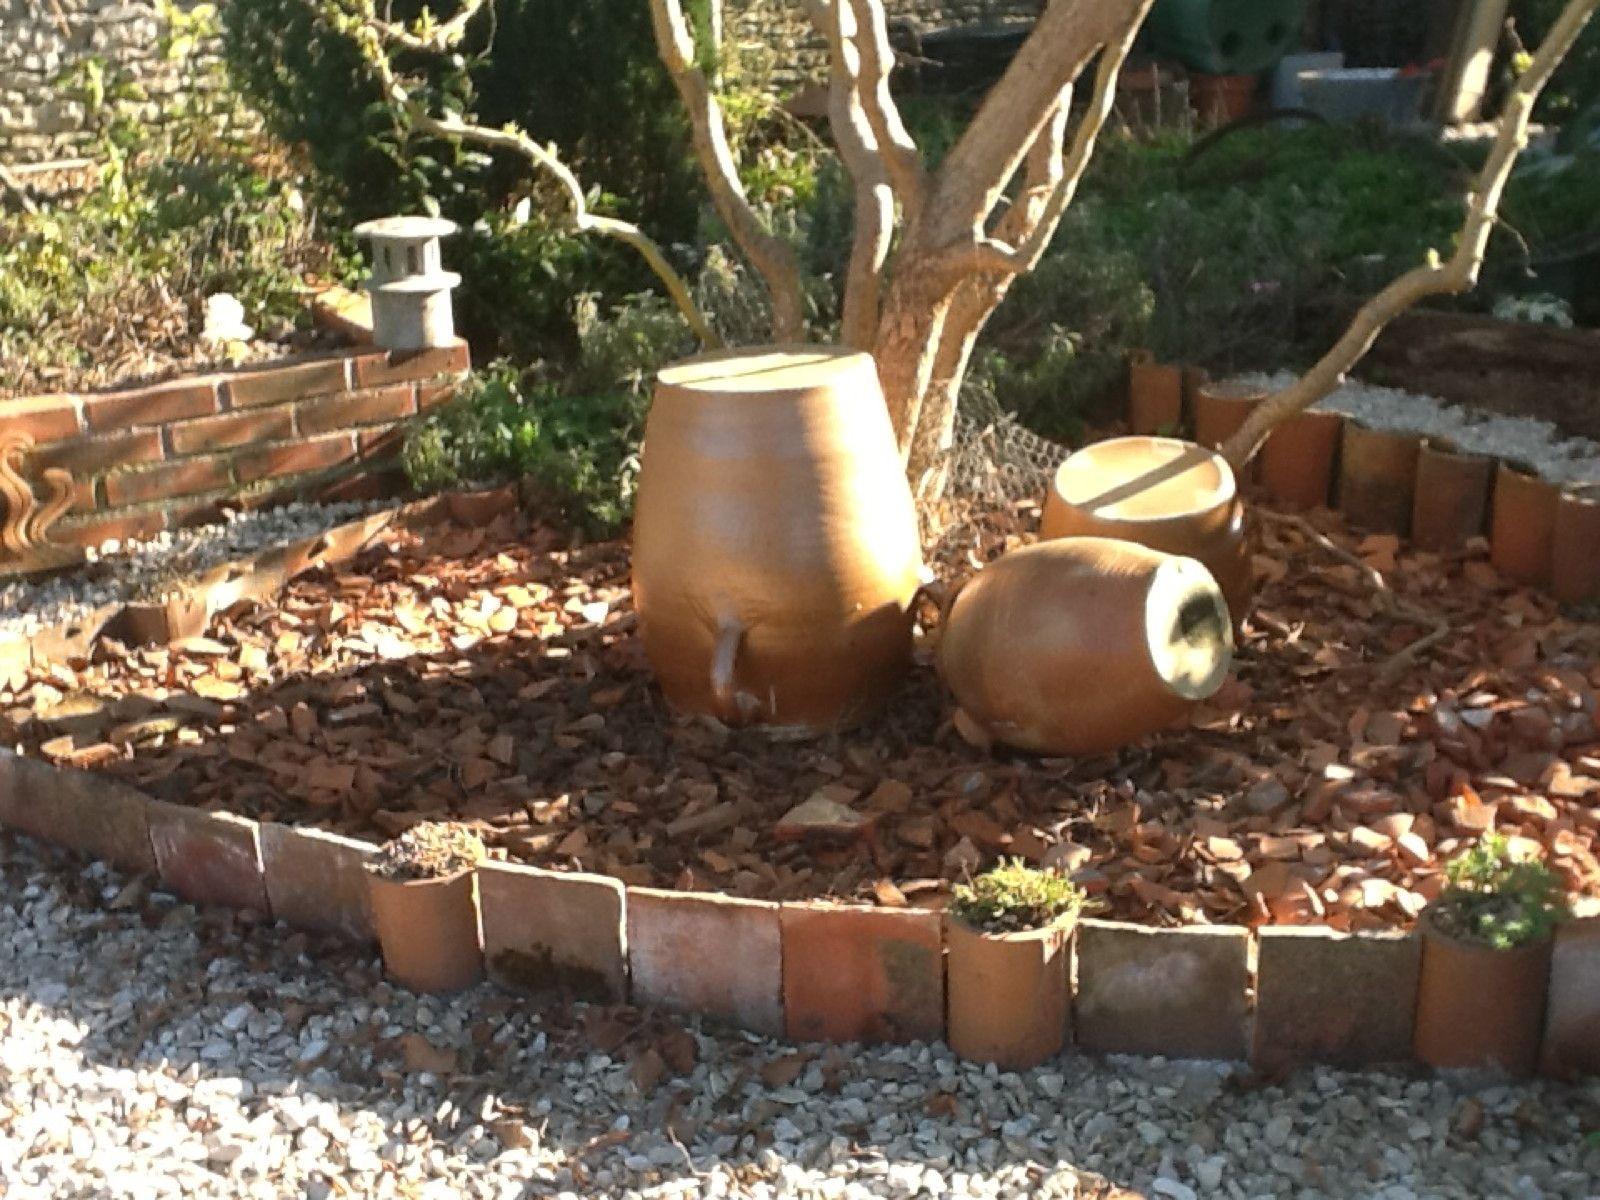 Pin by zencachou on astuces deco jardin pinterest - Deco jardin pinterest ...